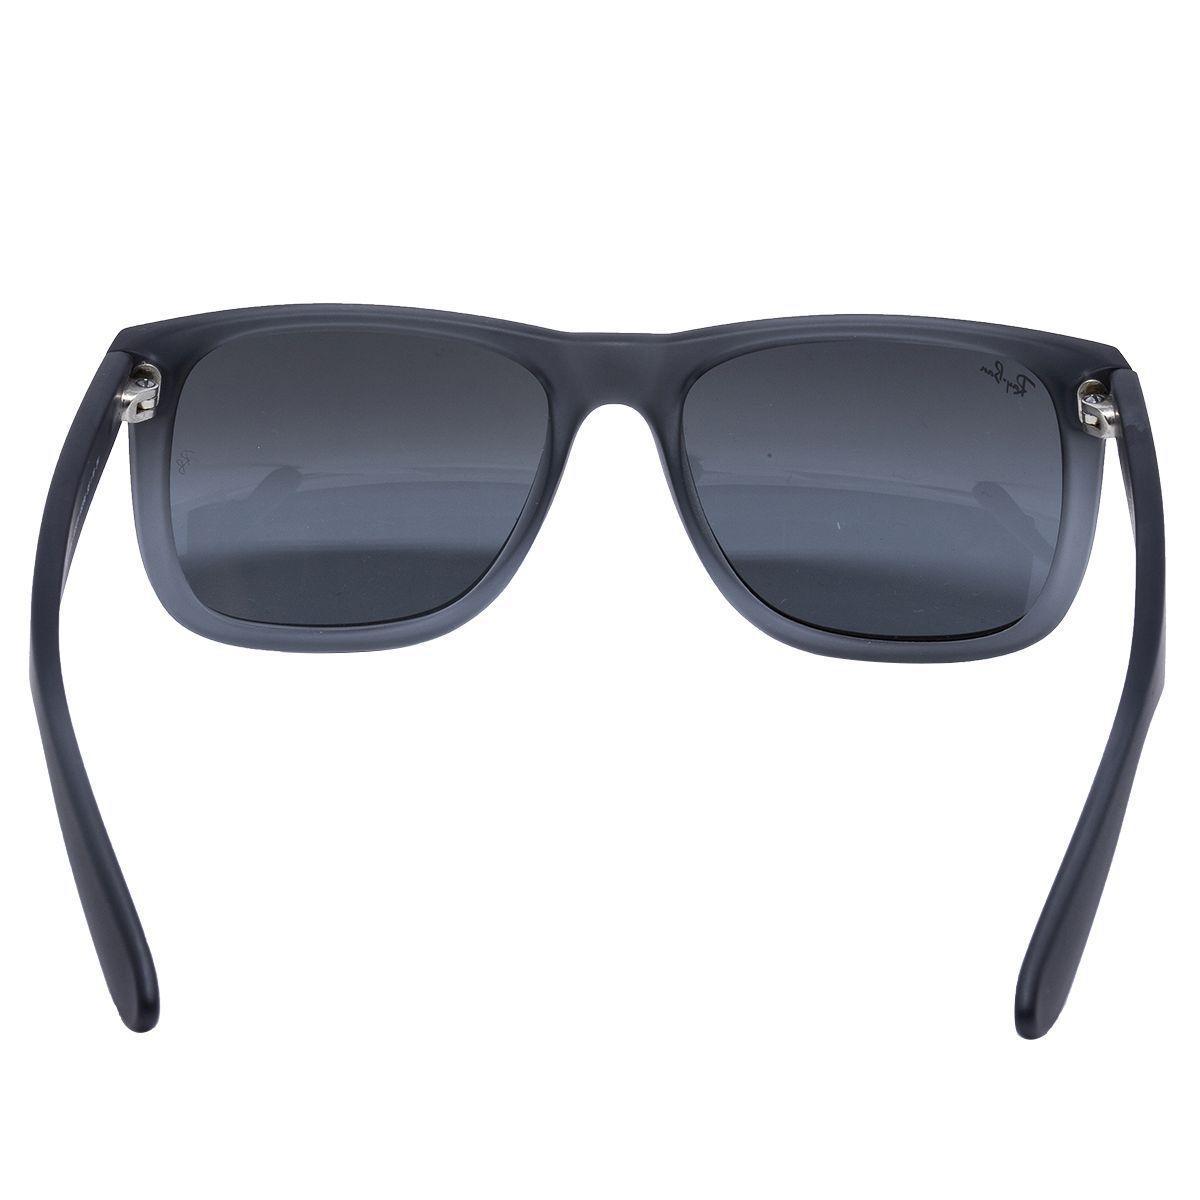 Óculos de Sol Ray Ban Justin RB4165L 852 88 - Acetato Preto Fosco, Lente  Cinza R  531,00 à vista. Adicionar à sacola b312bae688